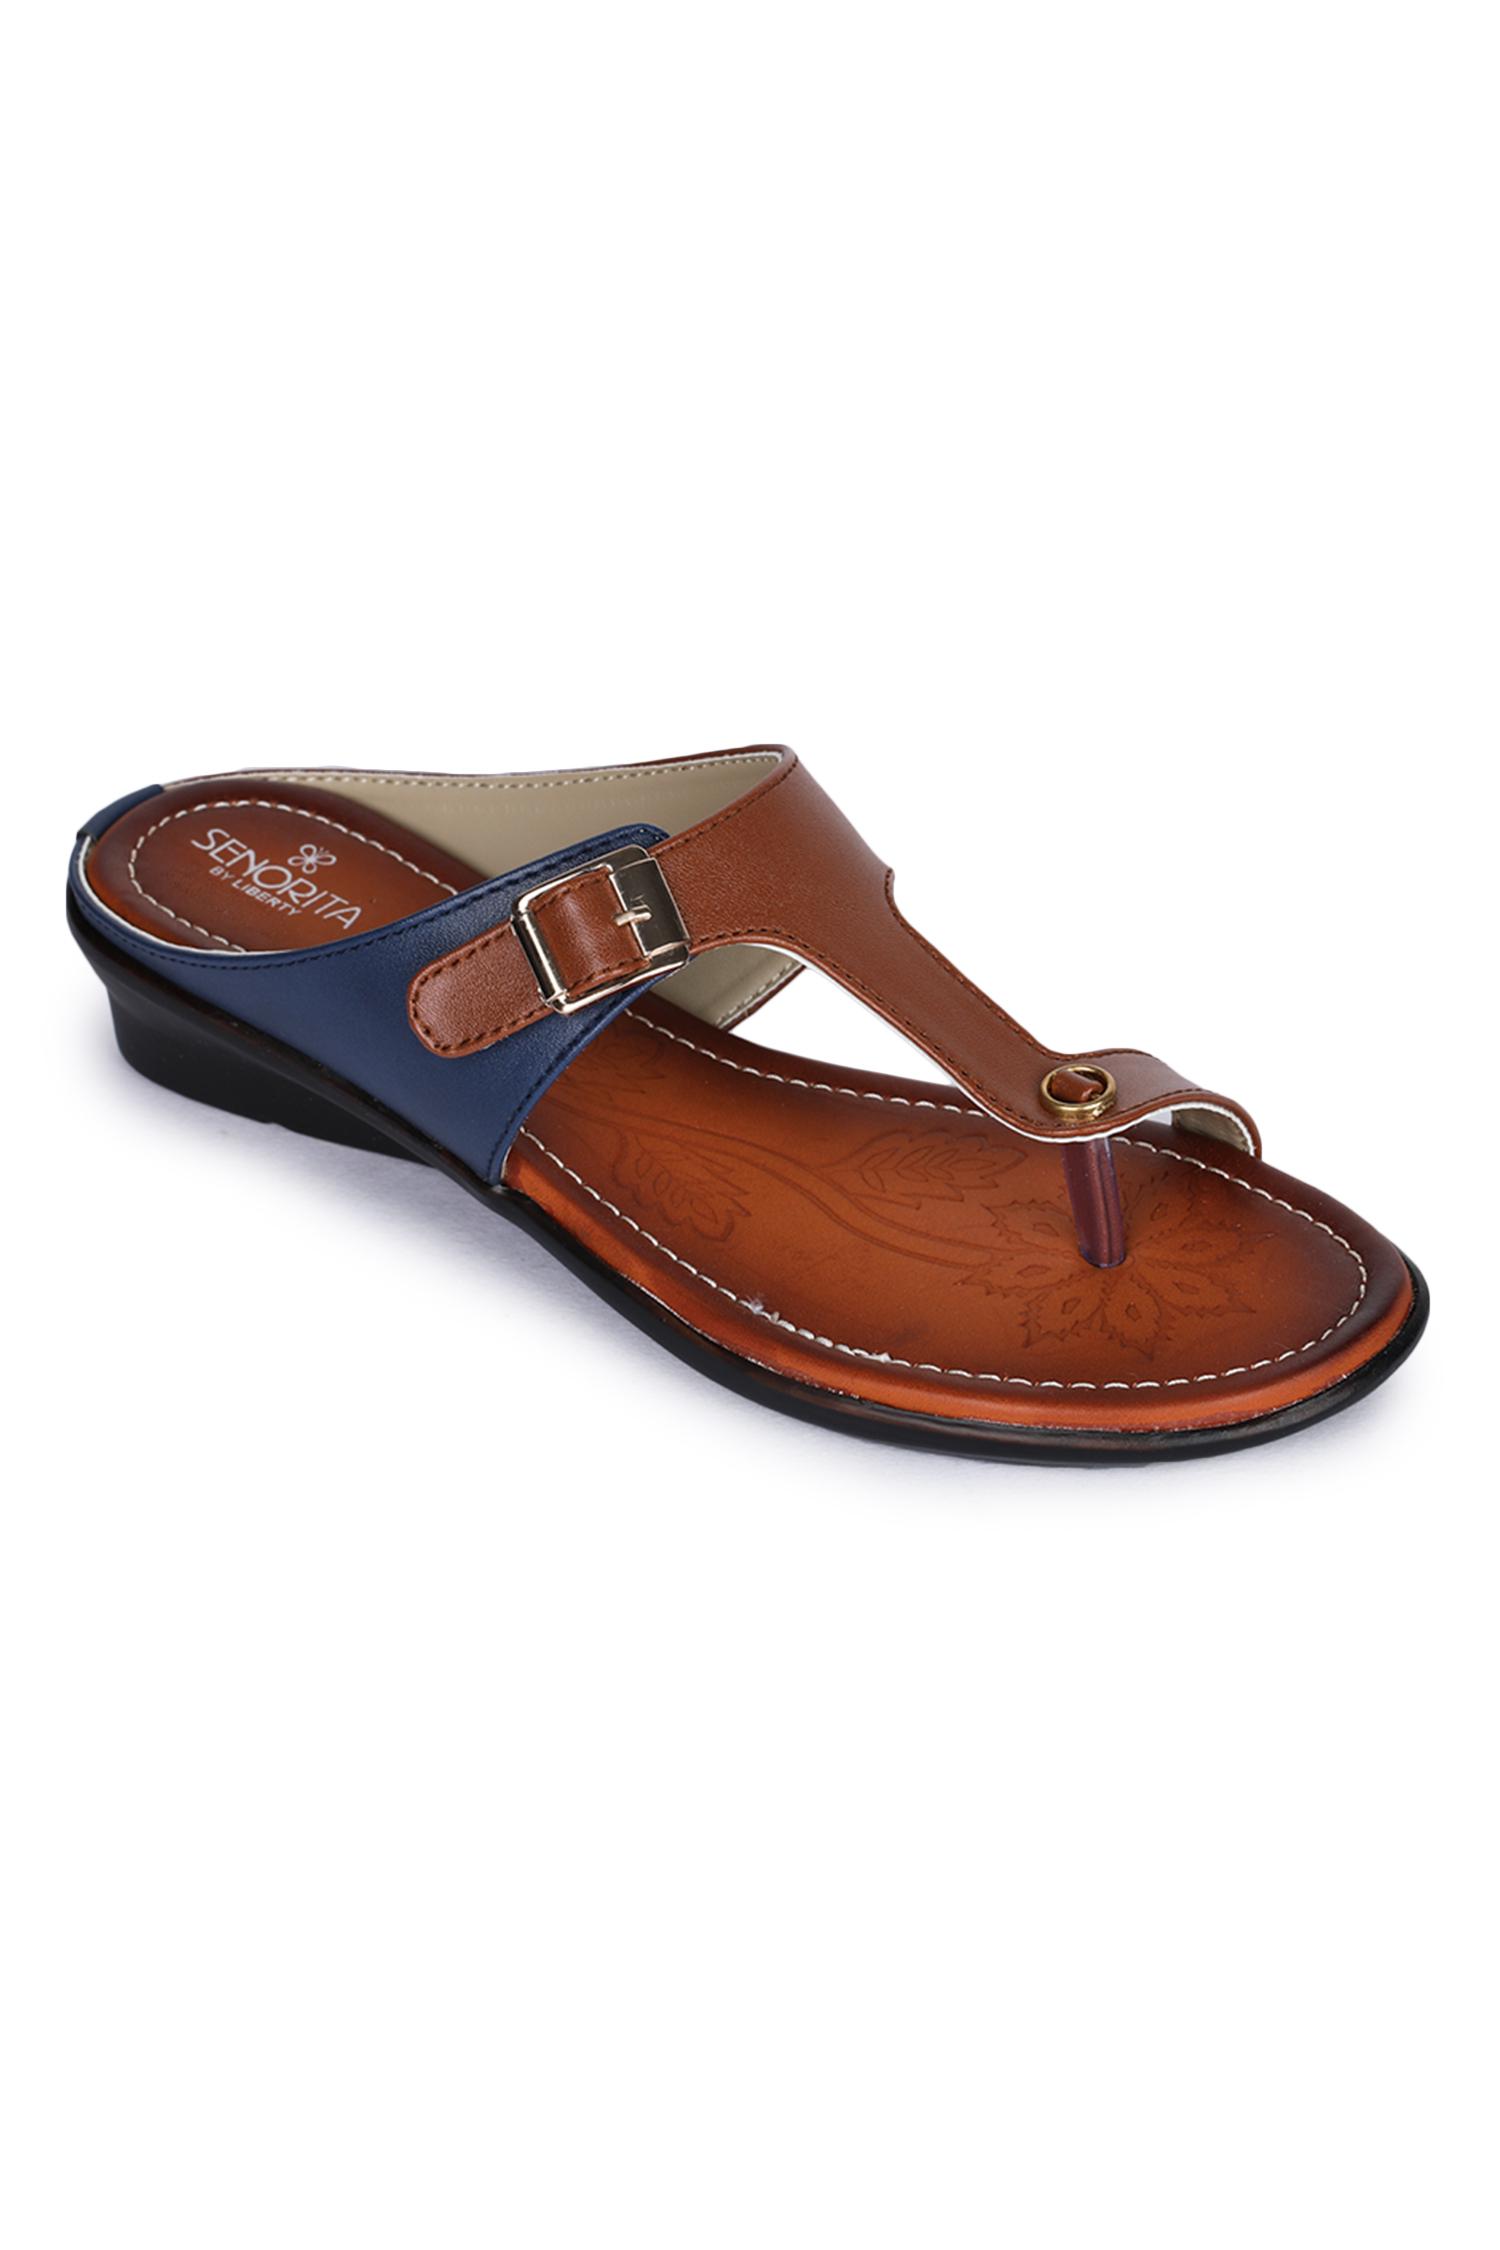 Liberty   Liberty SENORITA Sandals D1-06_TAN For - Women